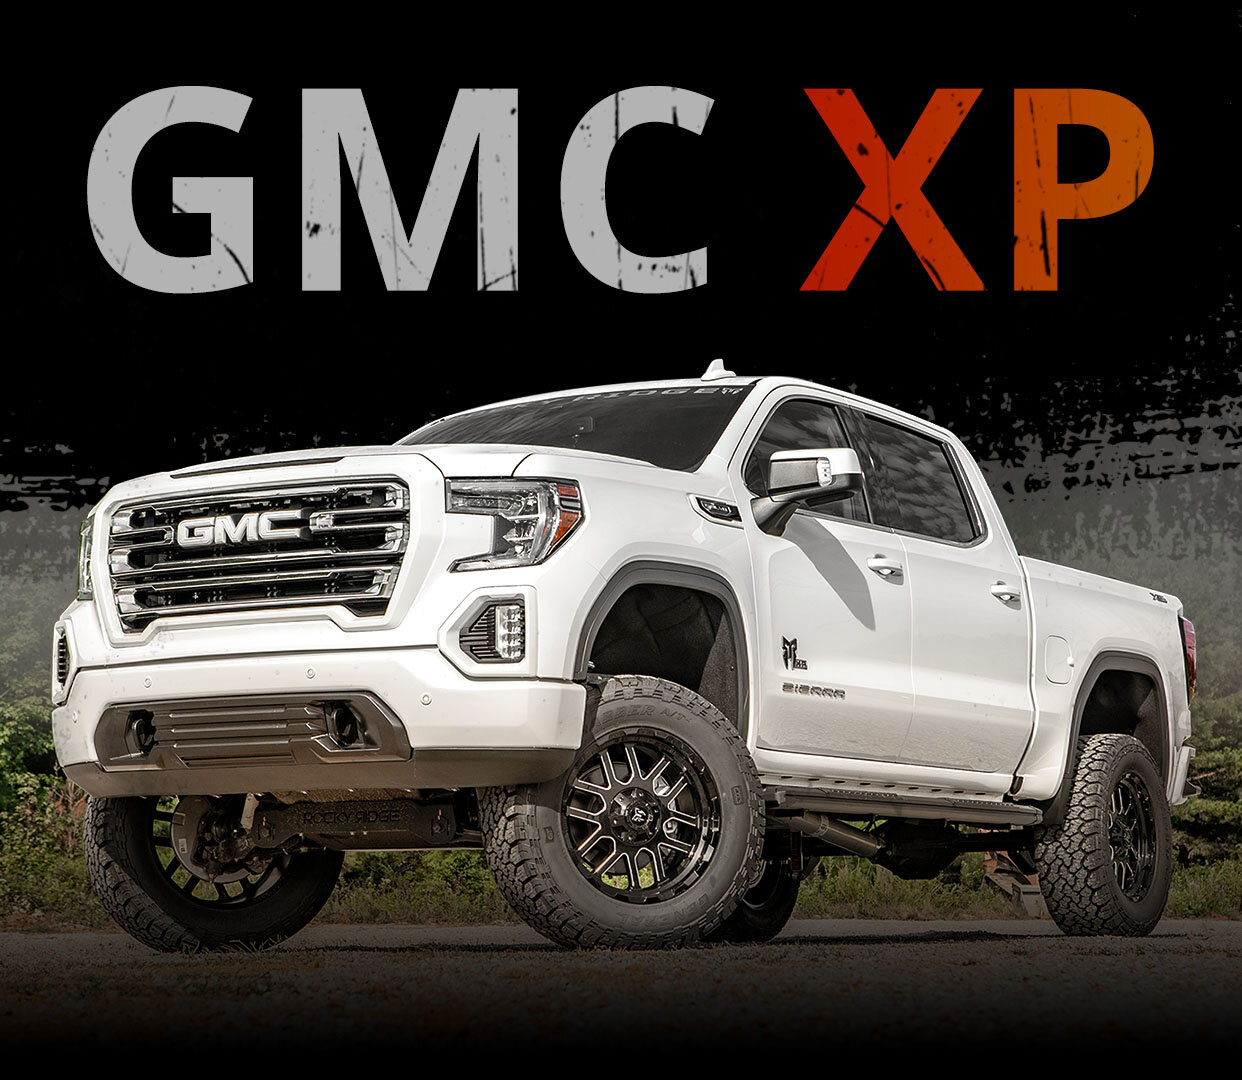 Lifted Gmc 1500 Truck Custom Sierra X Package Rocky Ridge Trucks